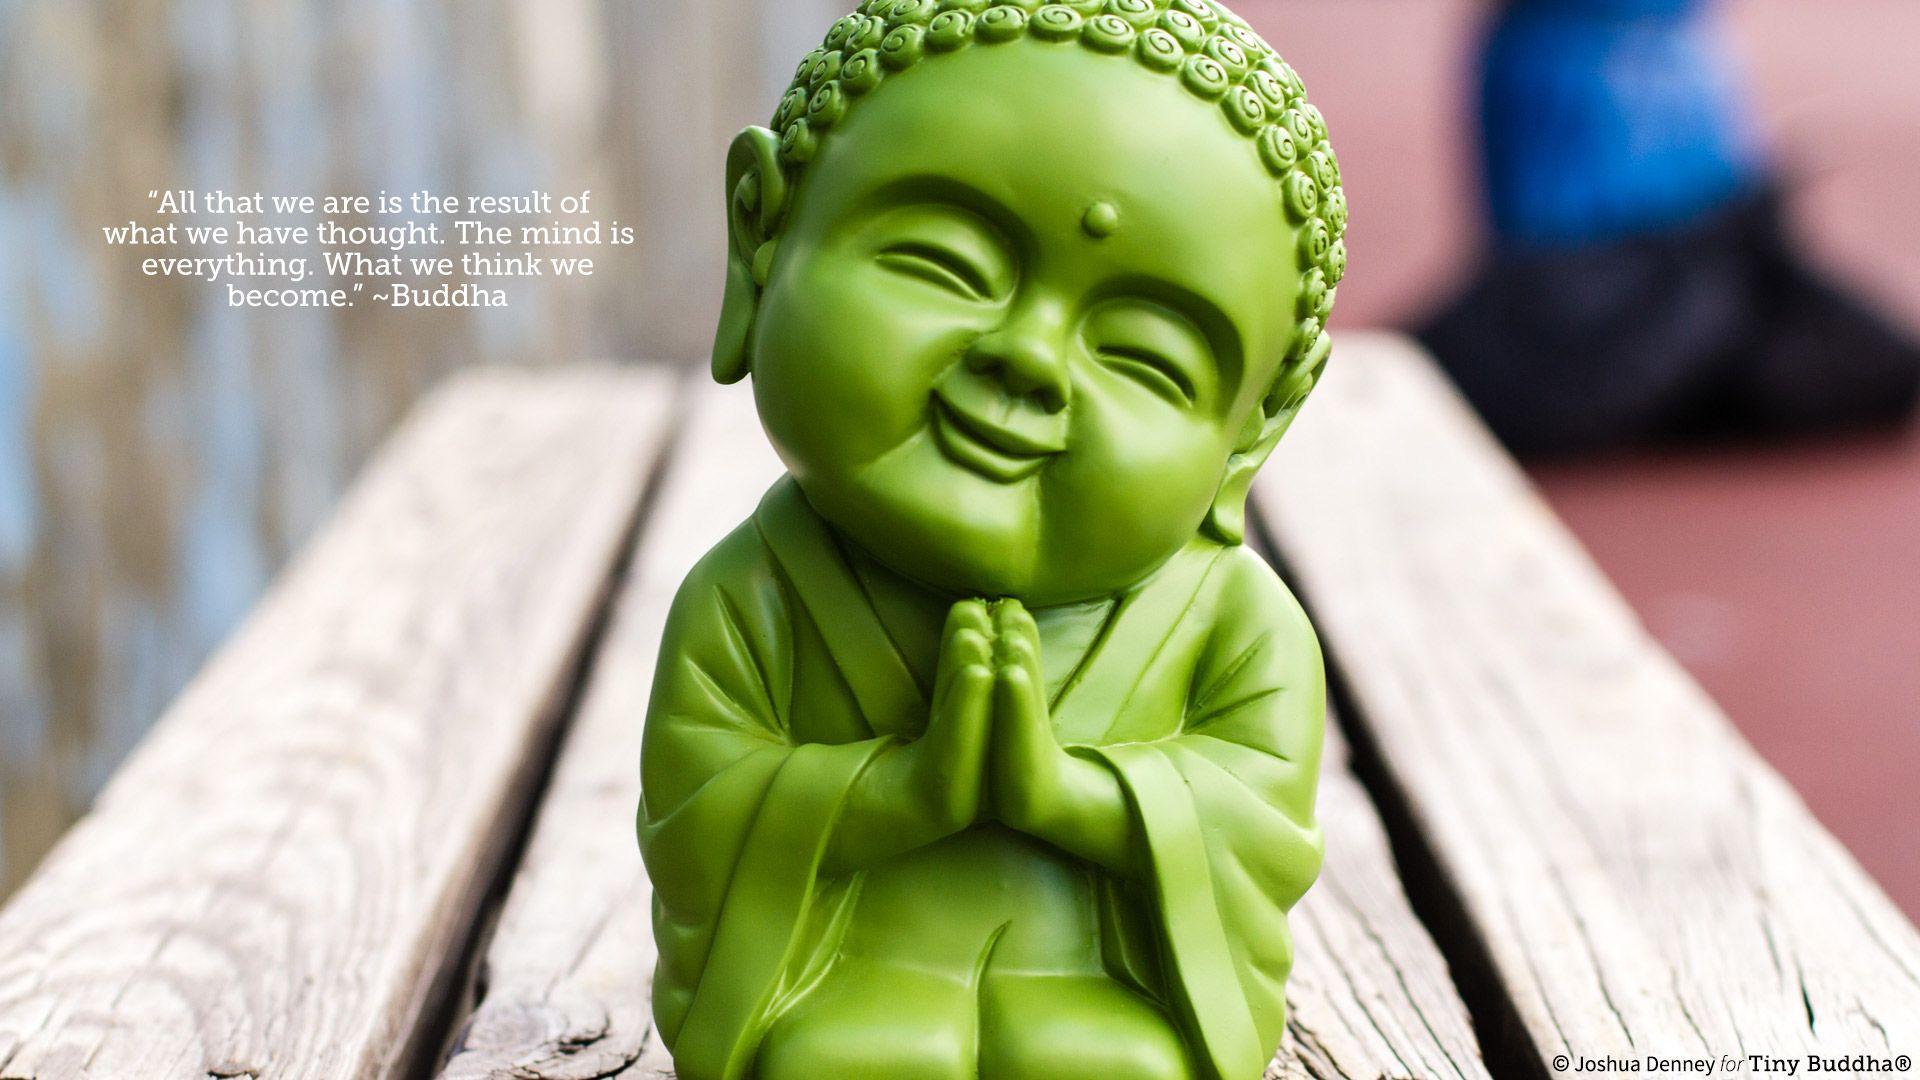 Cute Buddha Wallpapers Top Free Cute Buddha Backgrounds